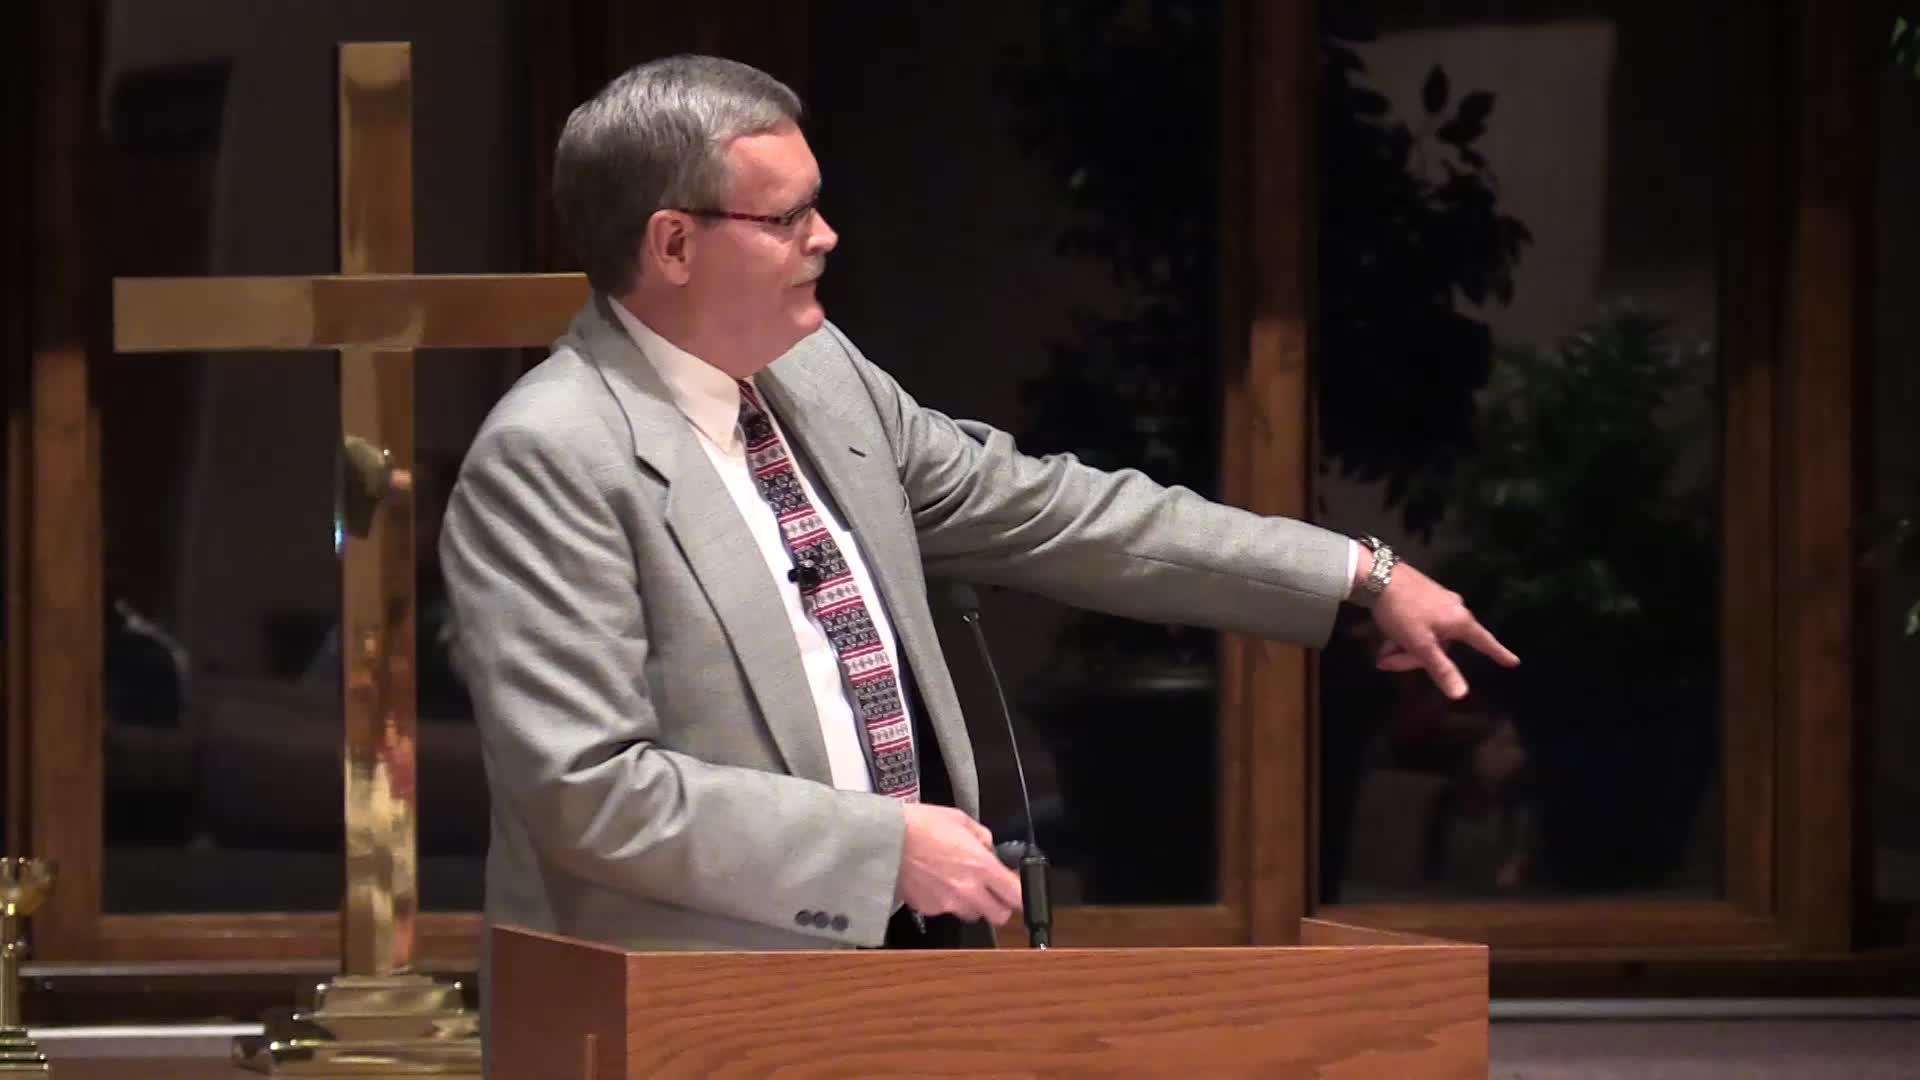 Dr. David Church